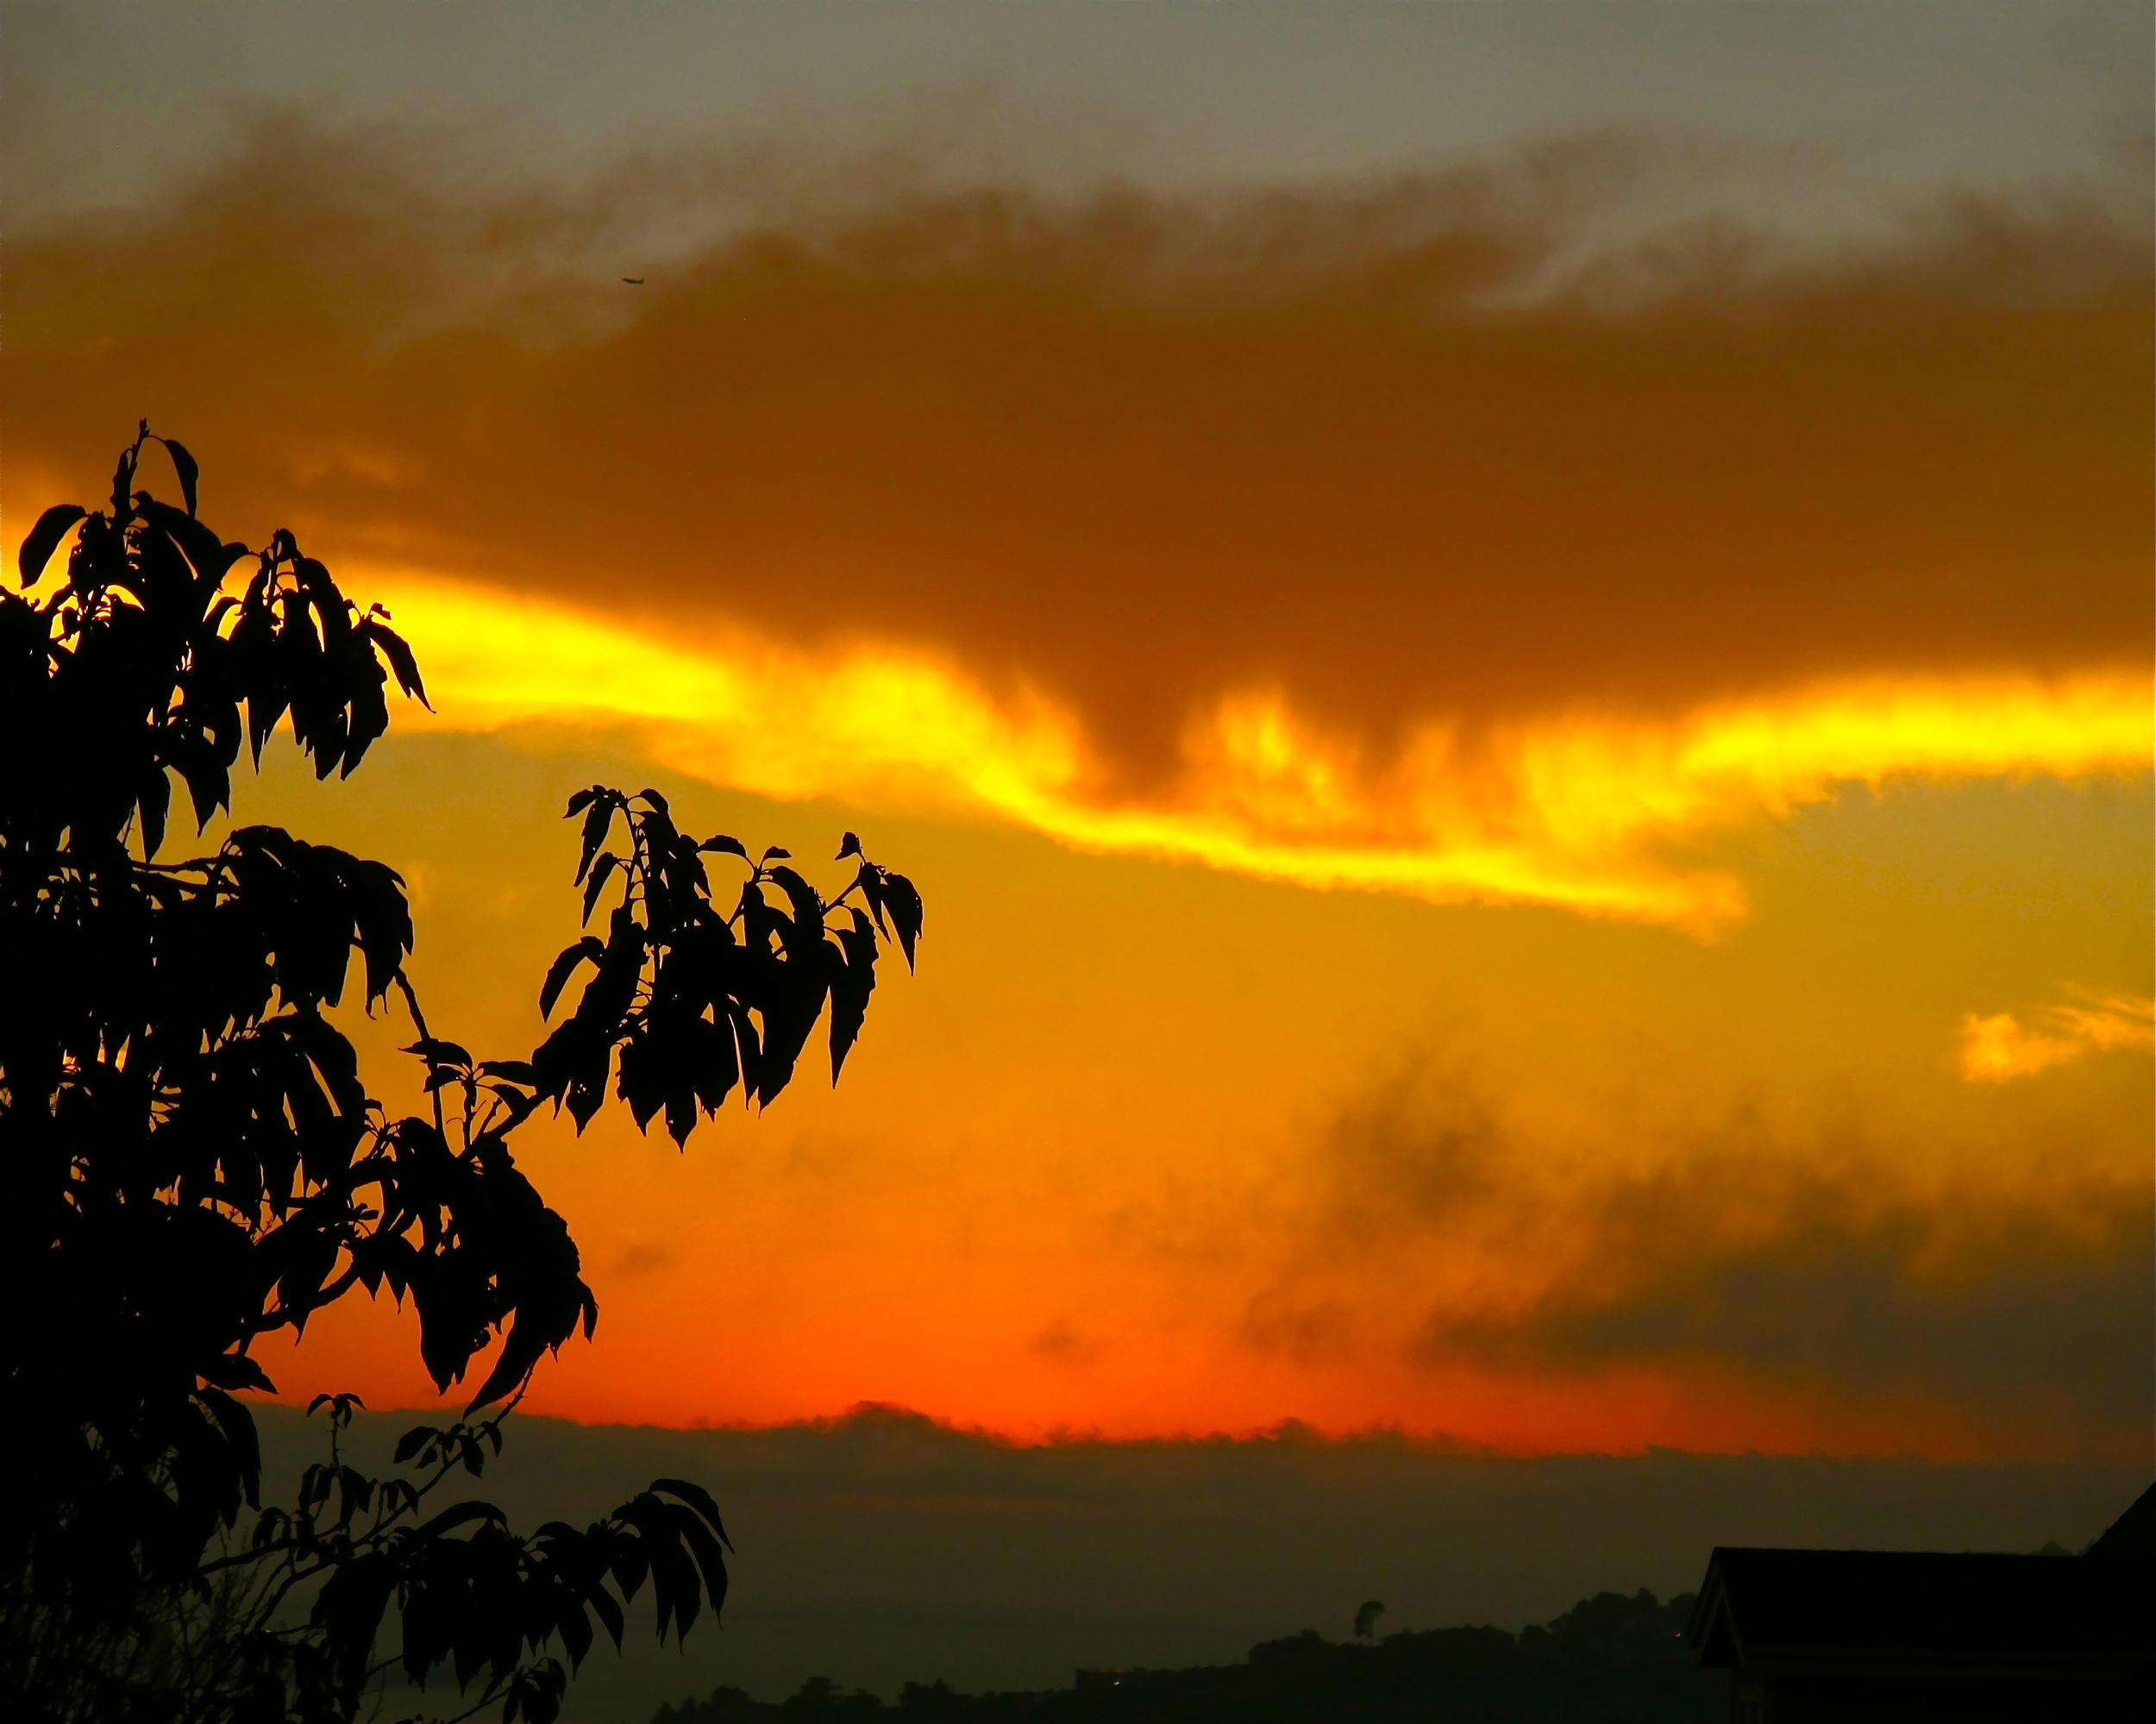 Pre-Sunrise over San Francisco Bay